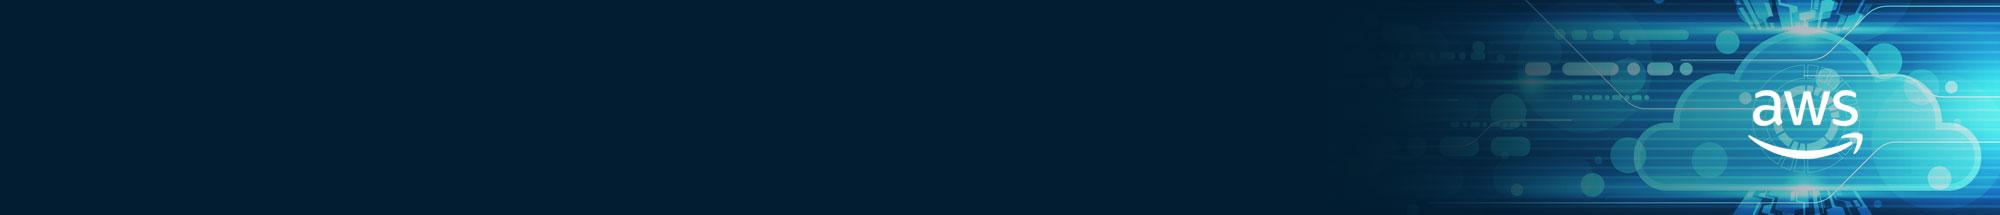 Amazon Cloud Computing Services